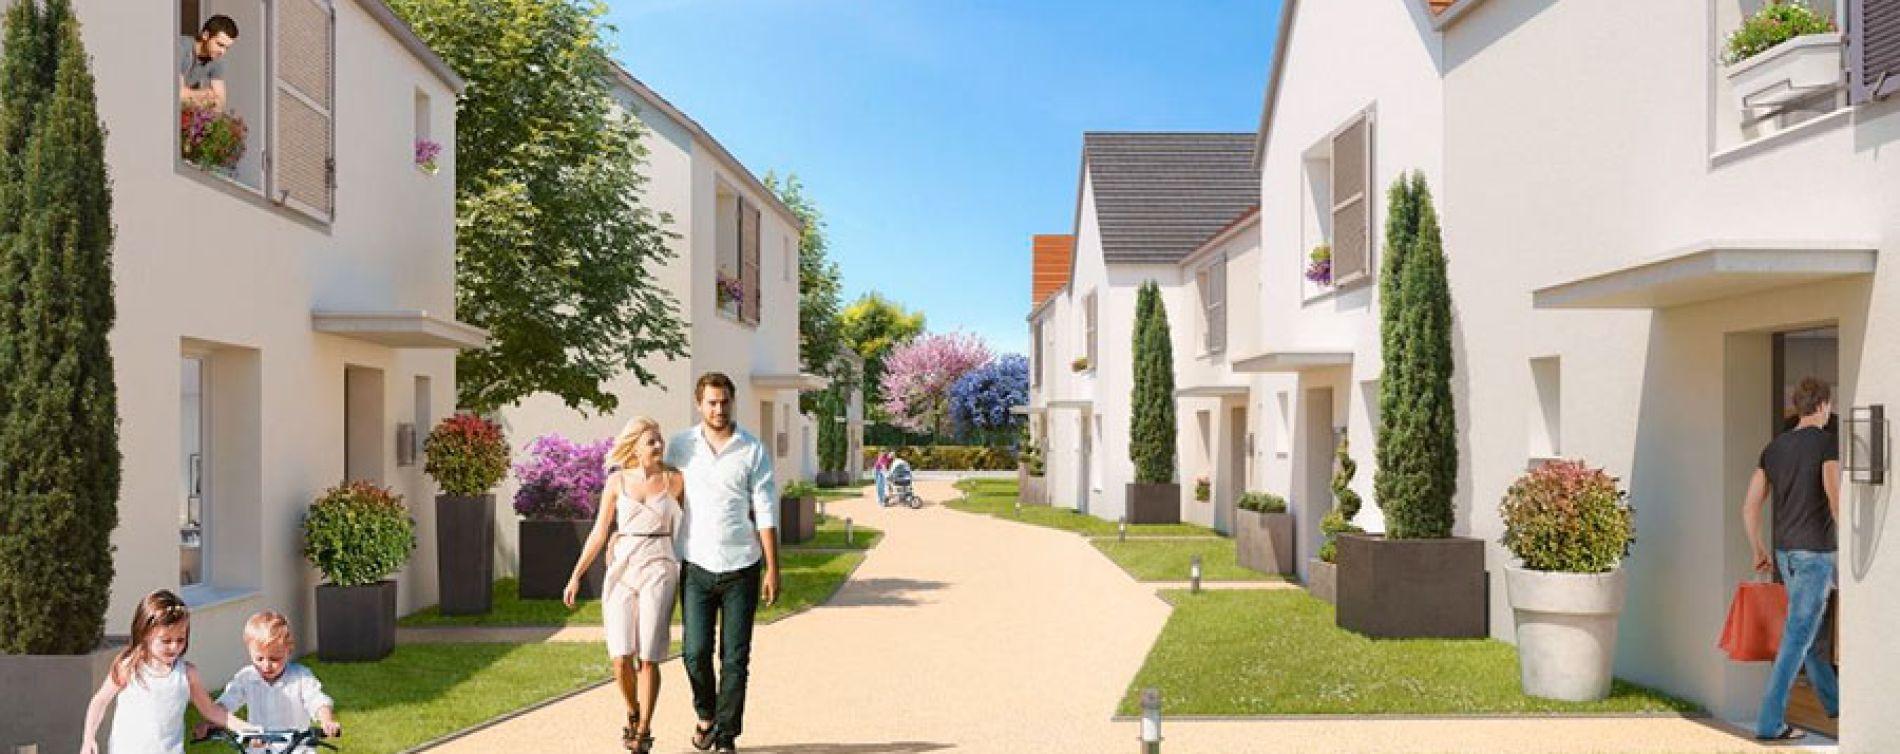 Ballainvilliers : programme immobilier neuve « Naturellement Ballain » en Loi Pinel